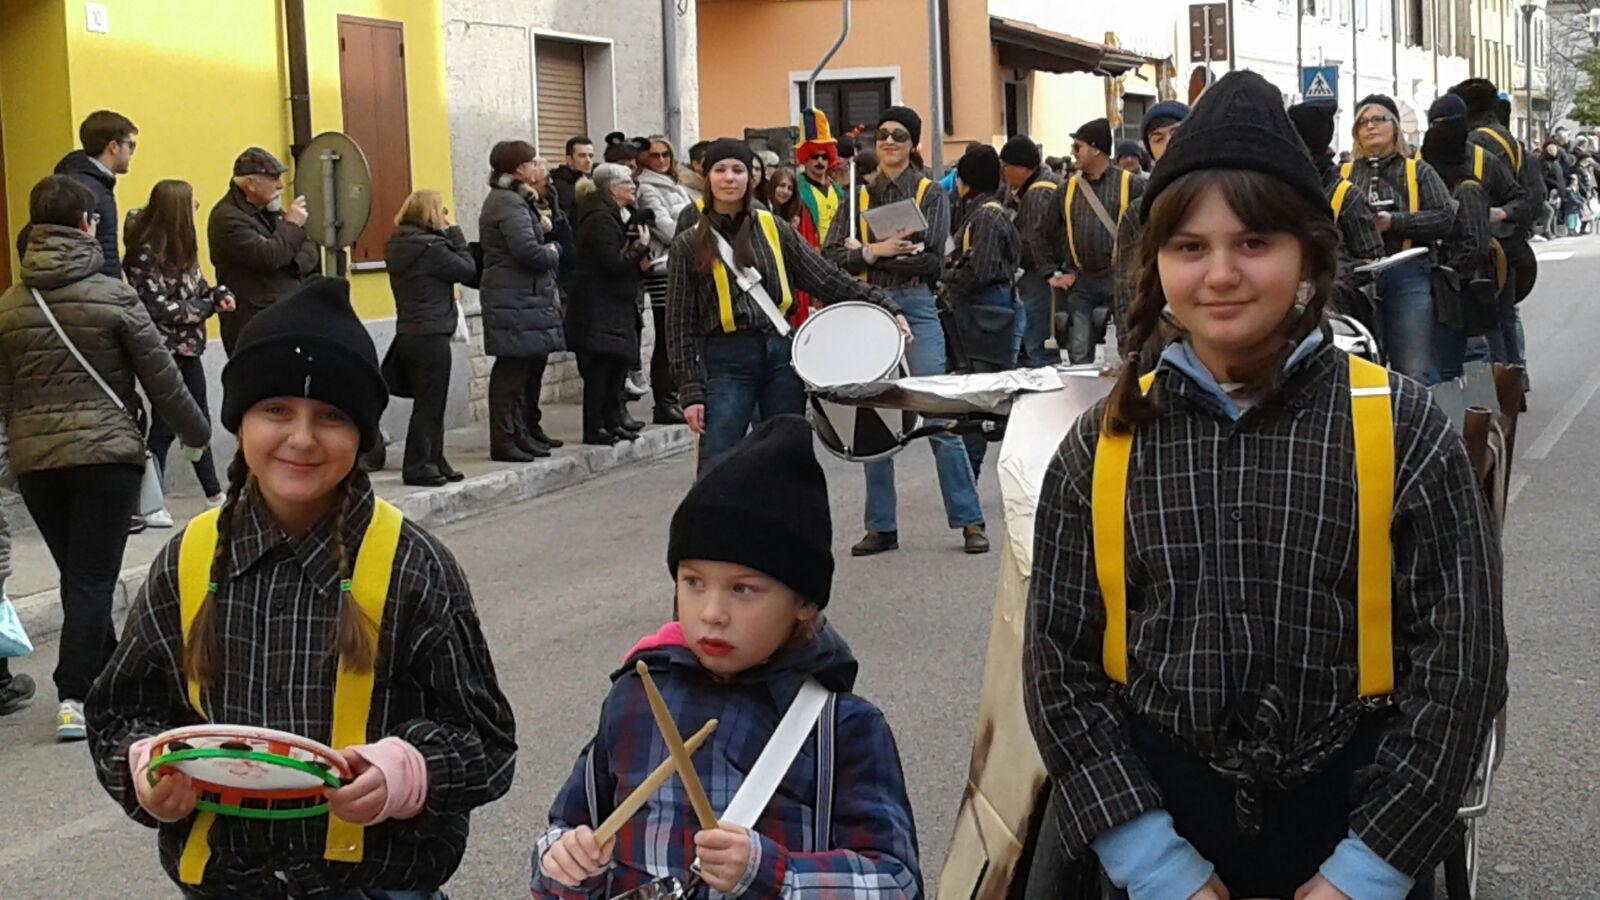 Carnevale 2017: I Boscaioli